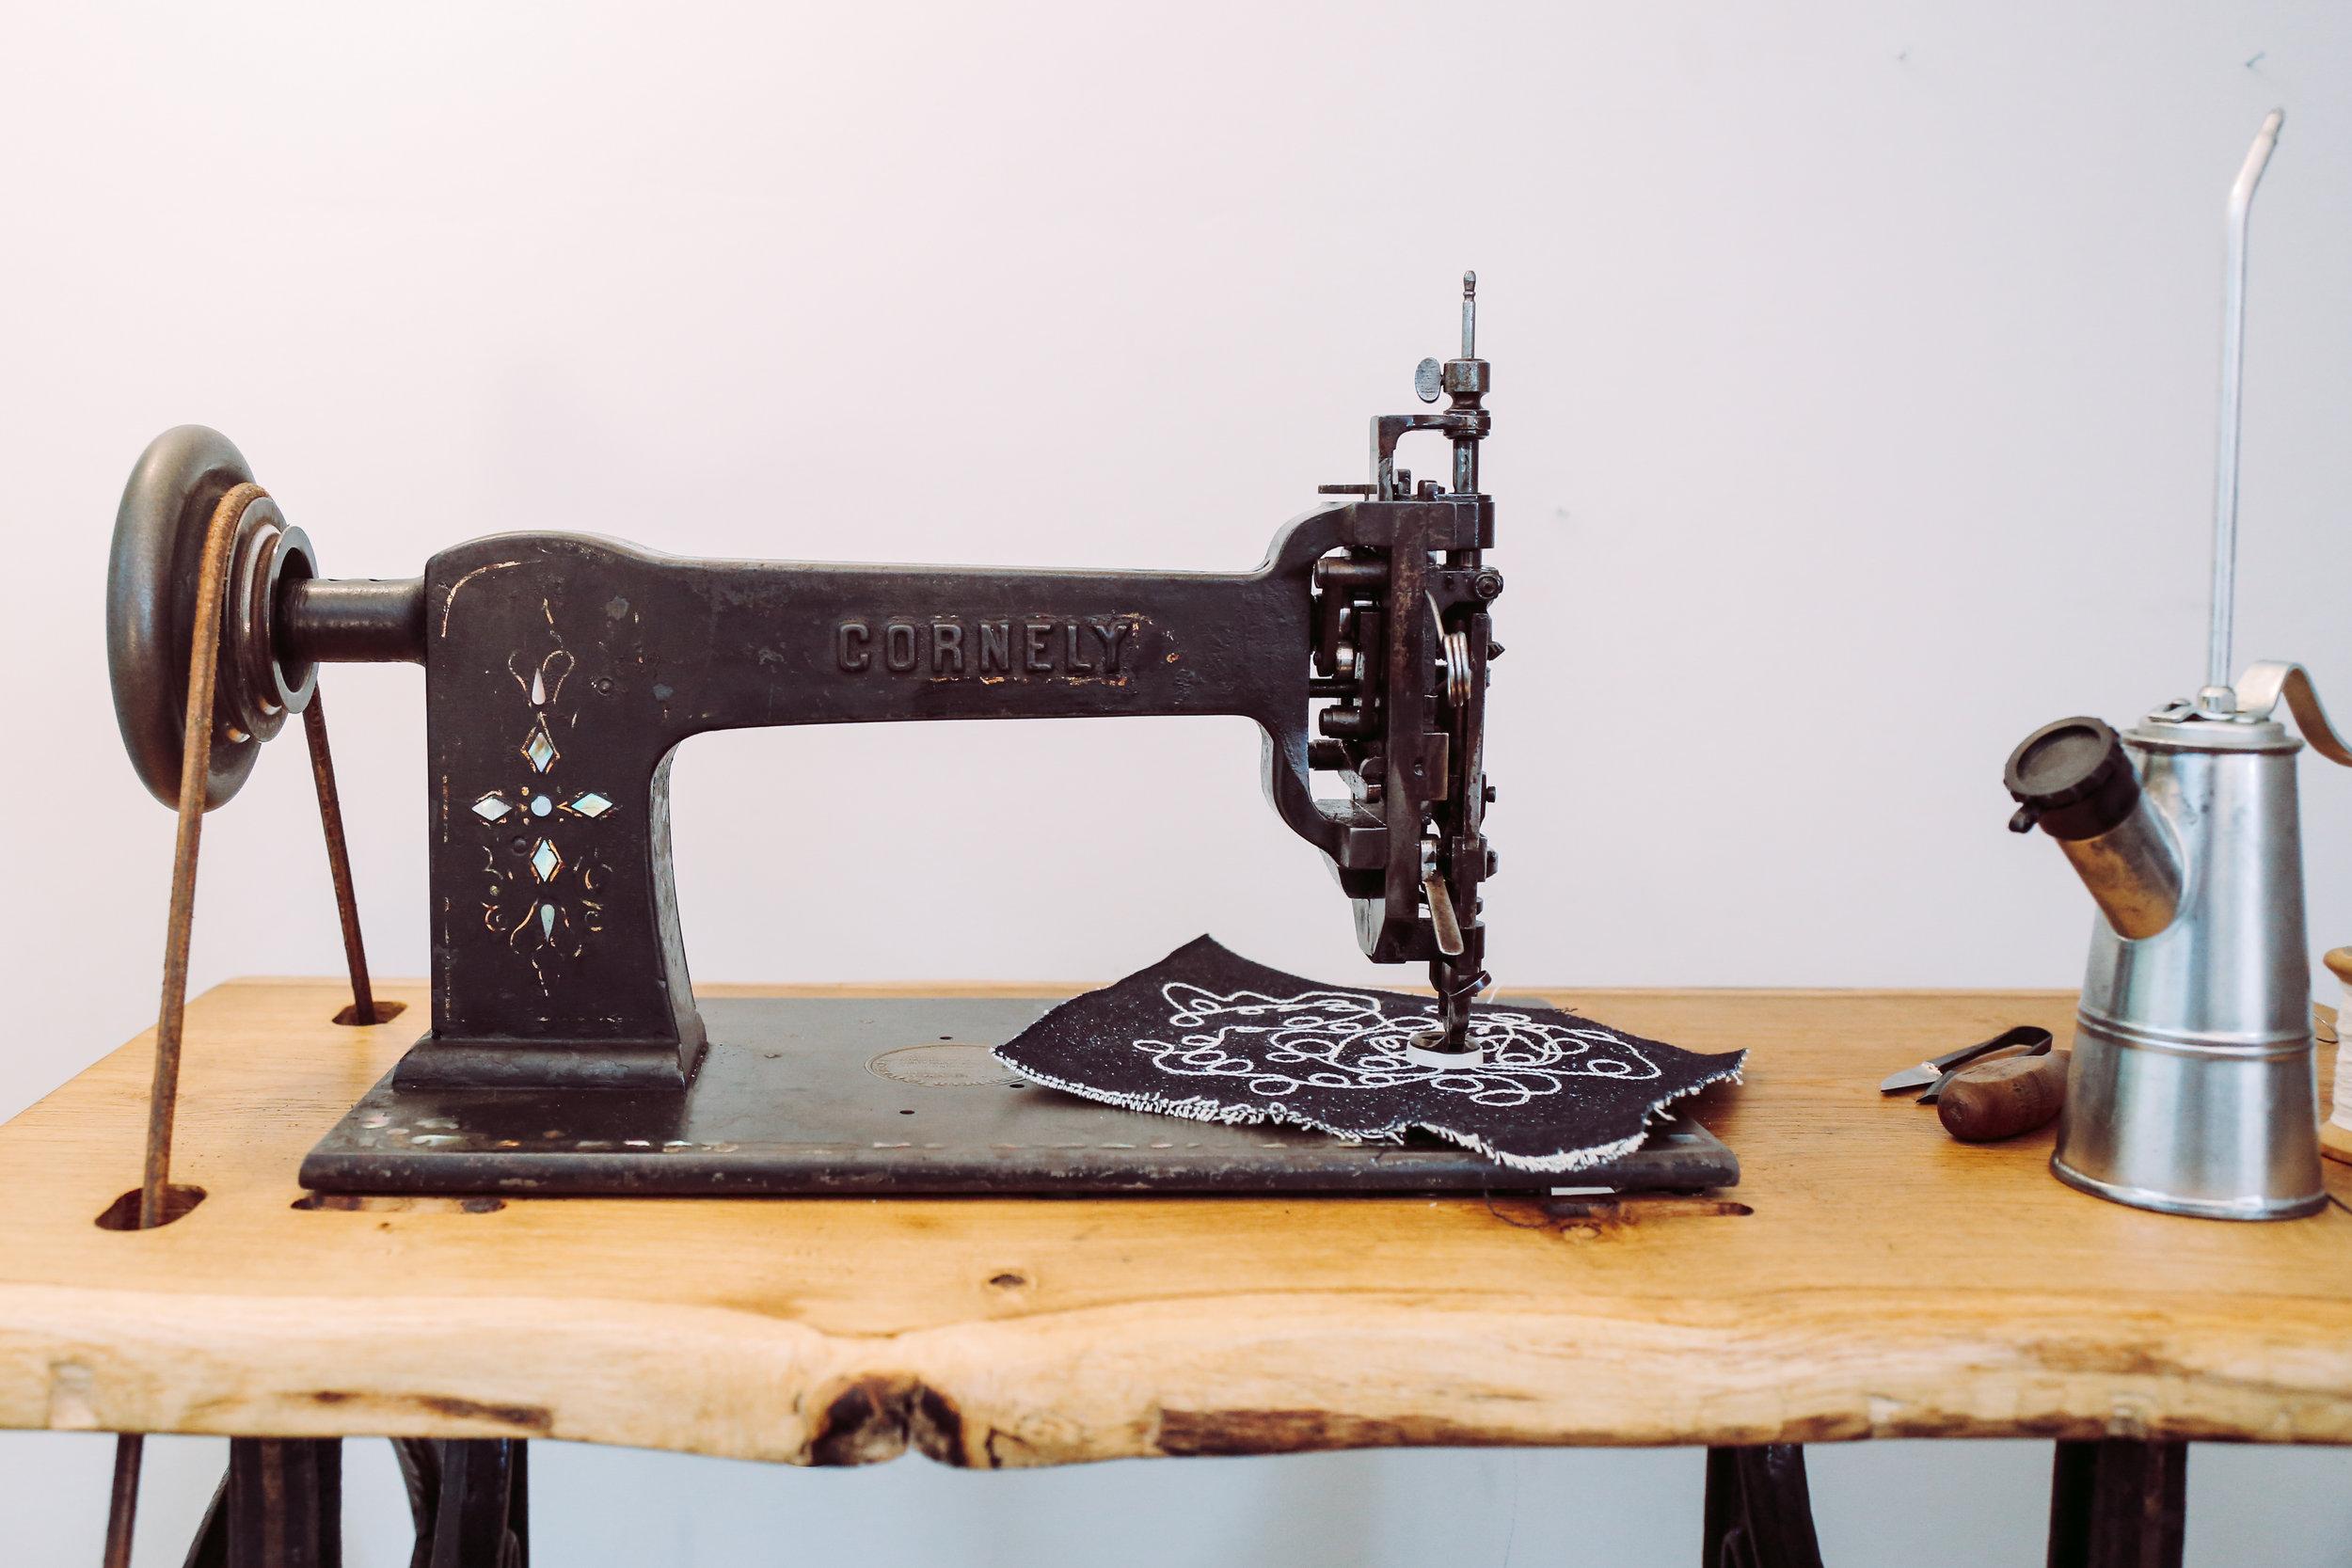 Saintchains Cornely A Chain Stitch Machine Handcrank Embroidery